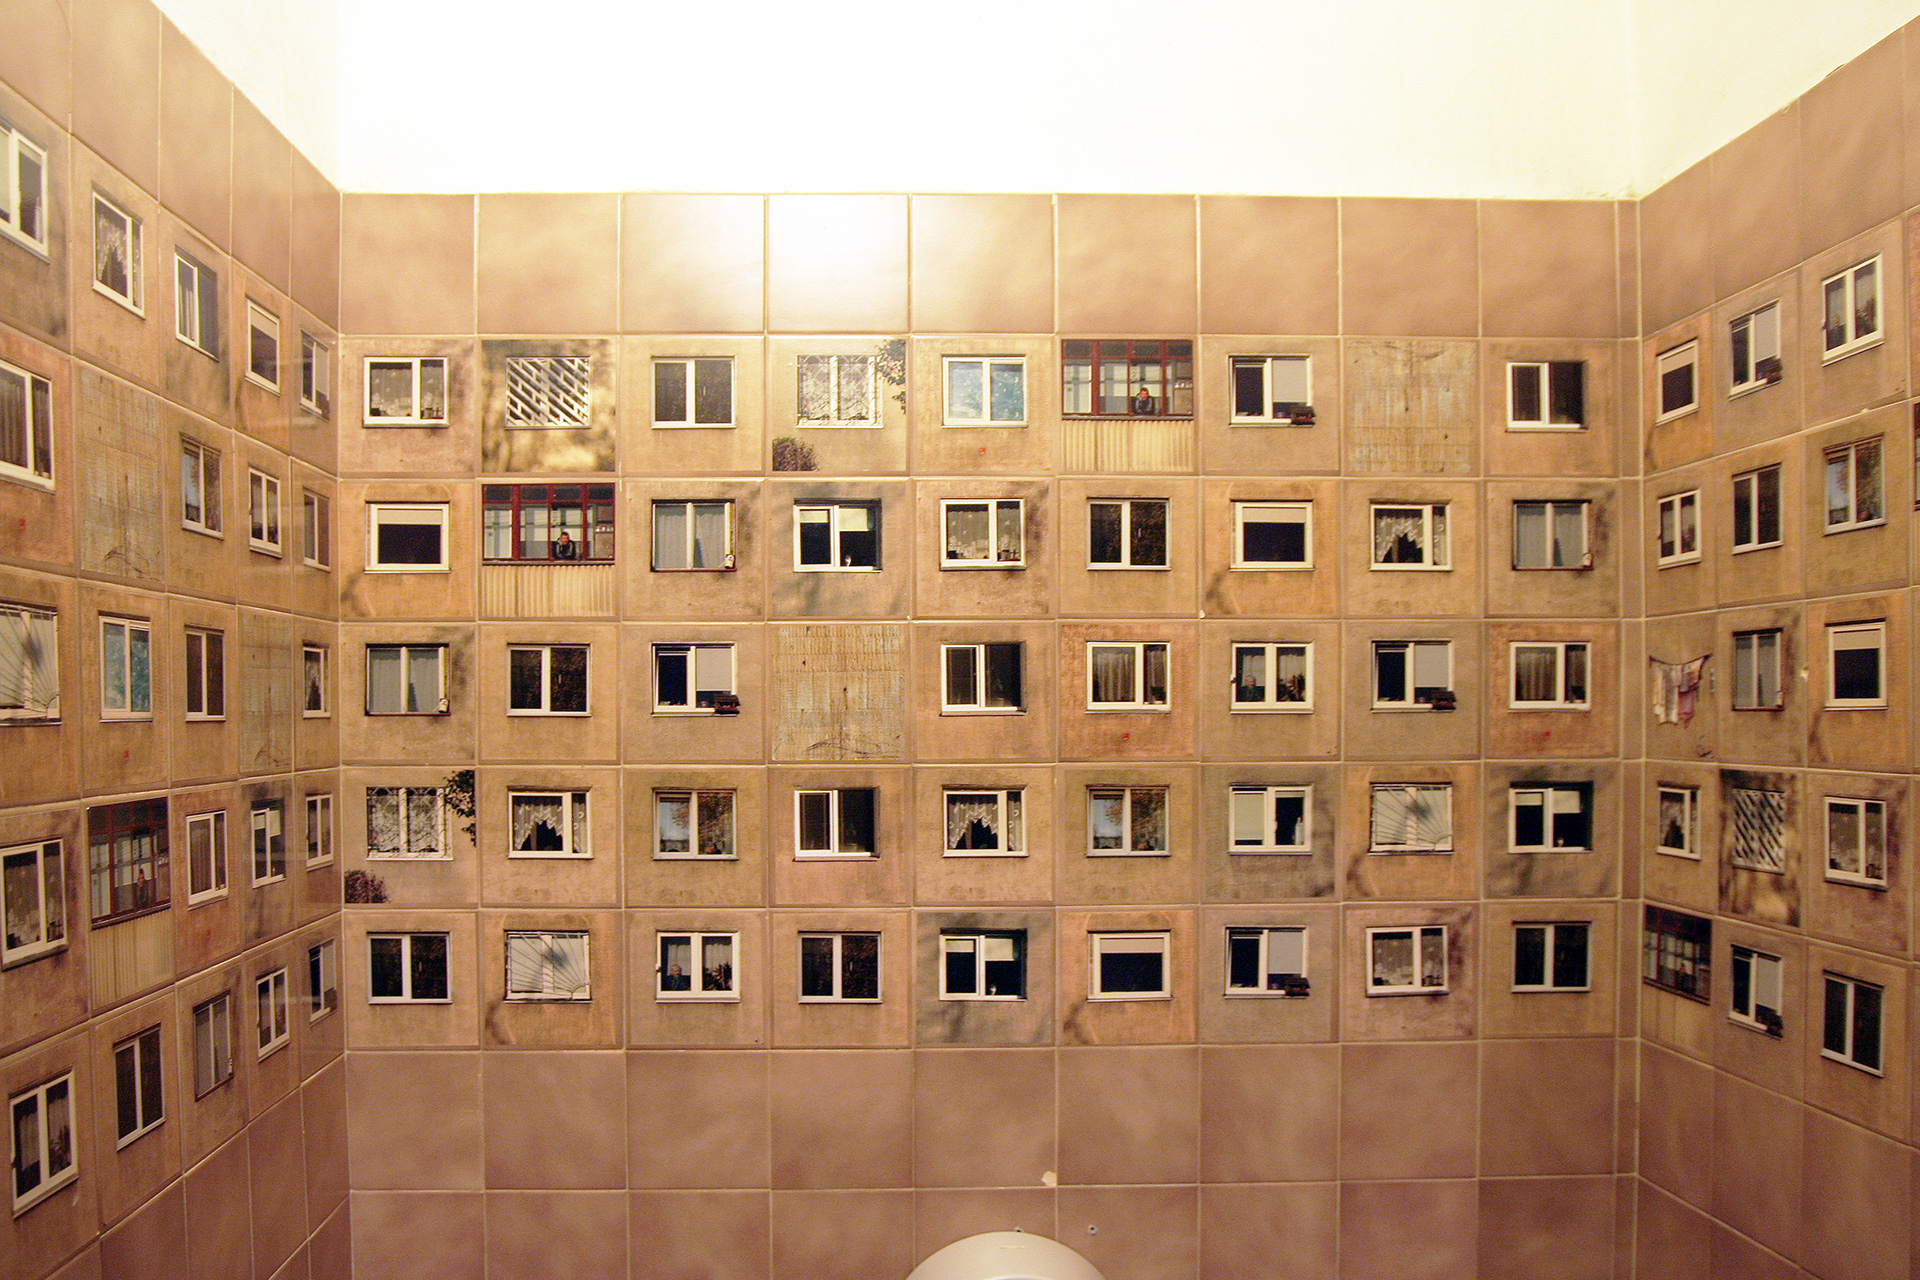 wc-tiles6.jpeg